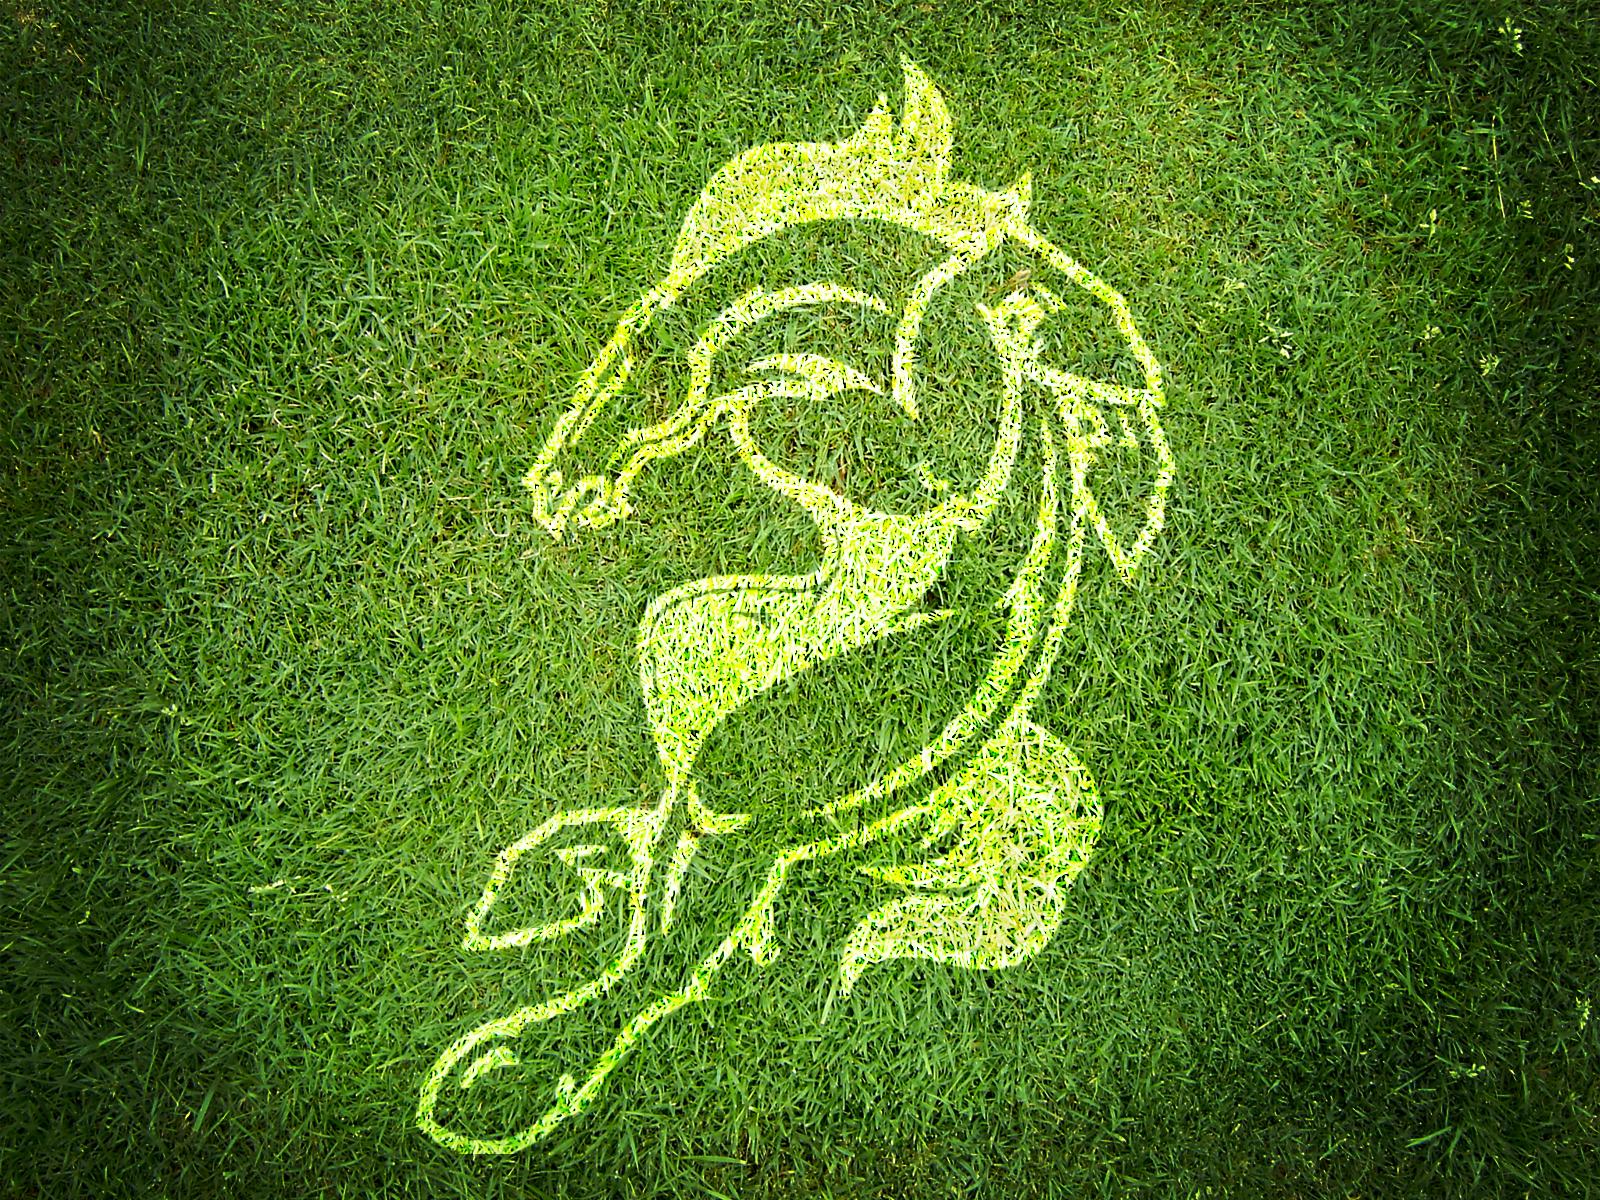 http://3.bp.blogspot.com/--i8EoqyGODw/TnjaONy1yPI/AAAAAAAABNc/pEjjCsO3150/s1600/Broncos_Logo_on_Grass_HD_Wallpaper.Net.jpg